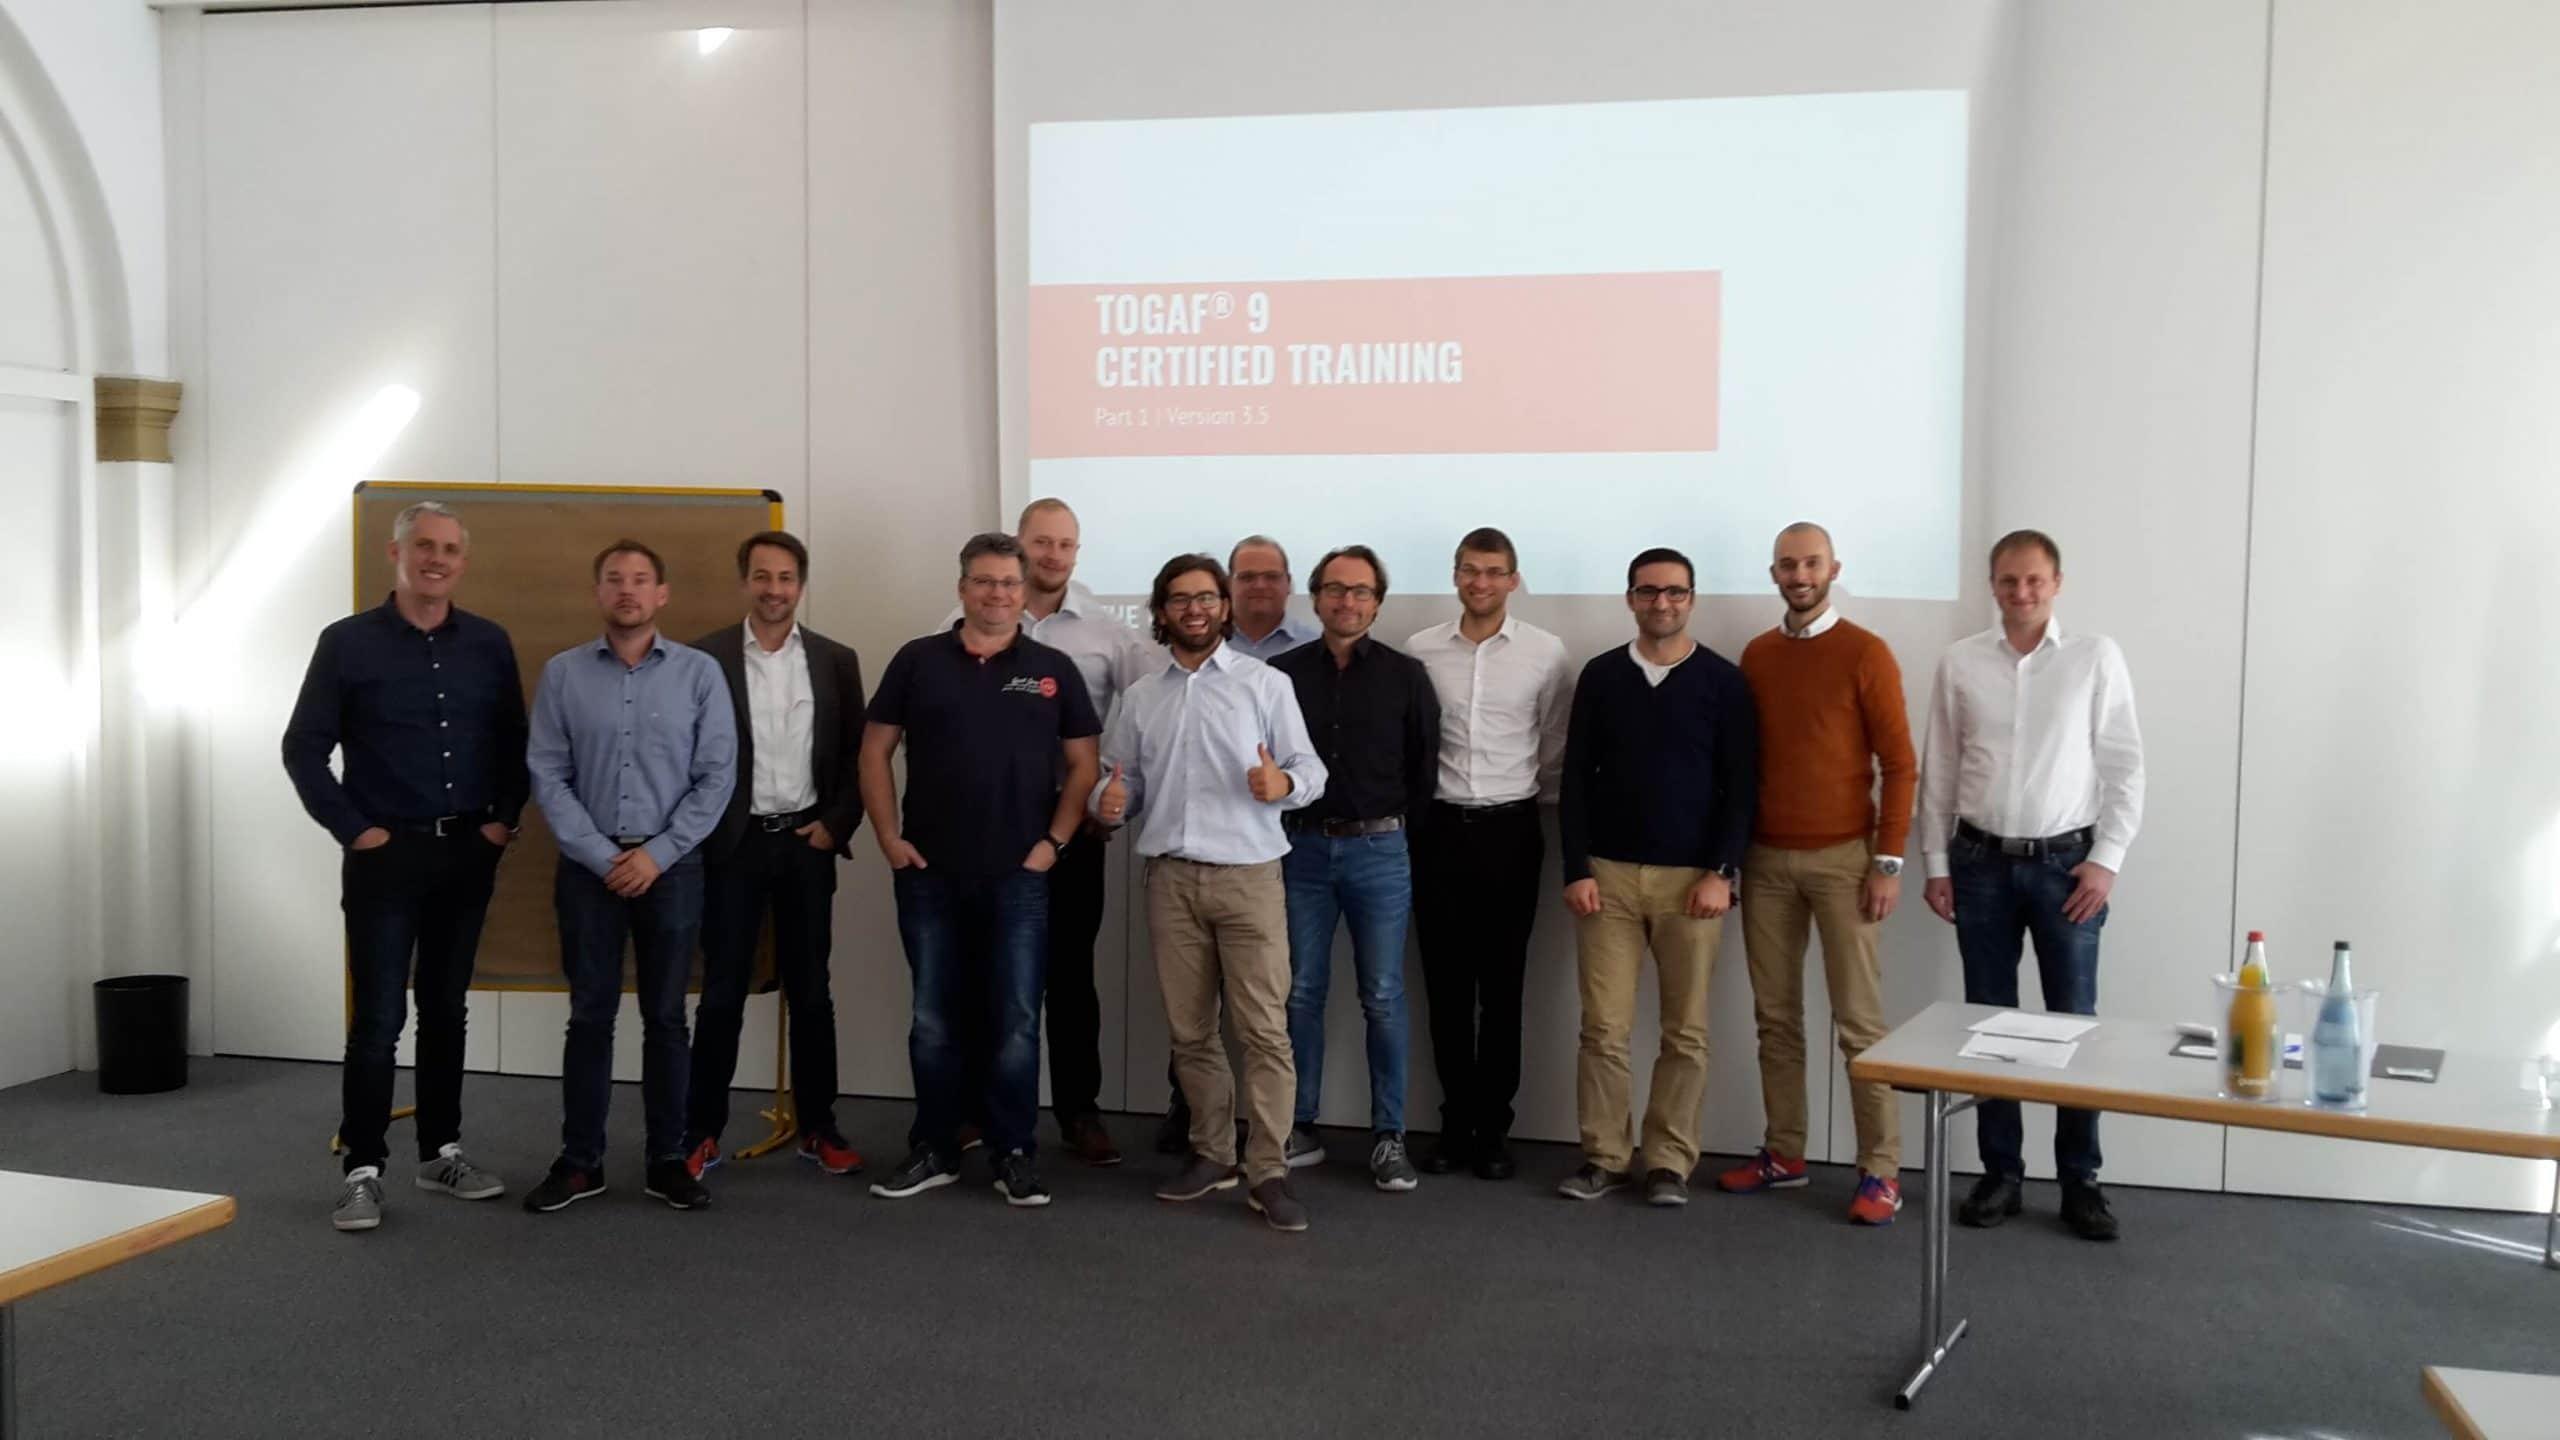 TOGAF® 9.2 September 2019 Ludwigsburg MHP incompany Zweite Inhouse-Schulung für MHP